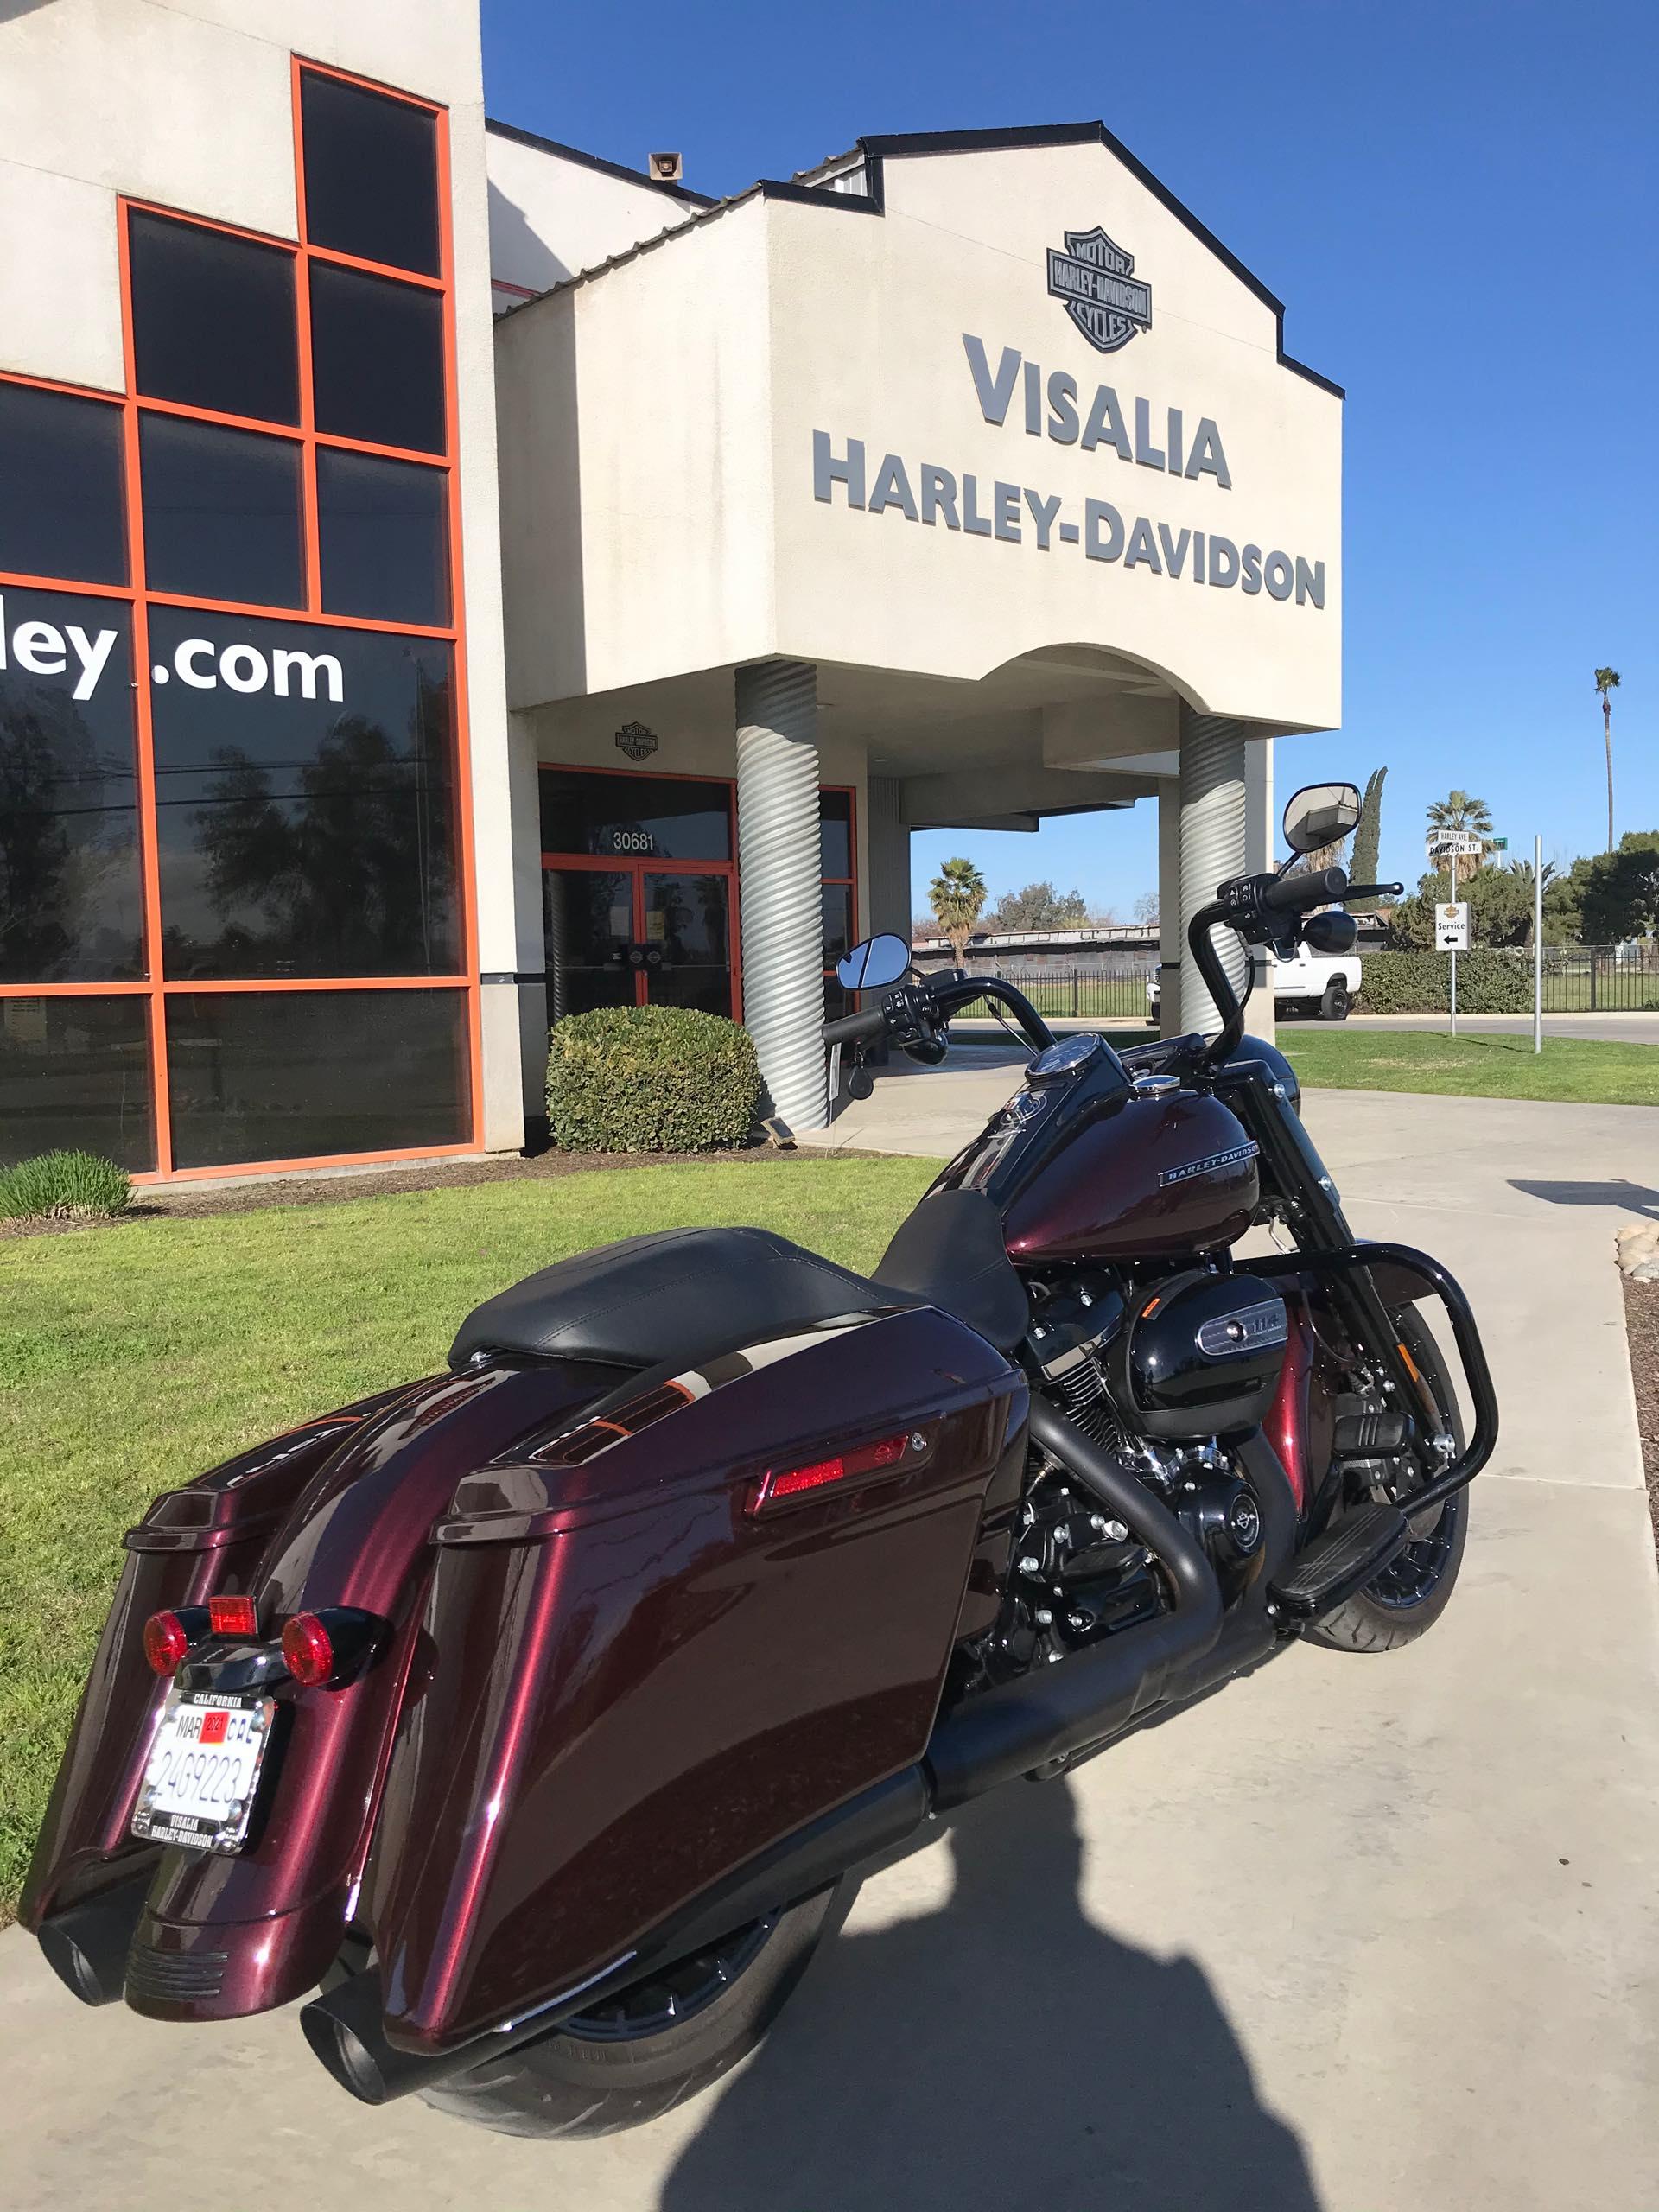 2019 Harley-Davidson Road King Special at Visalia Harley-Davidson